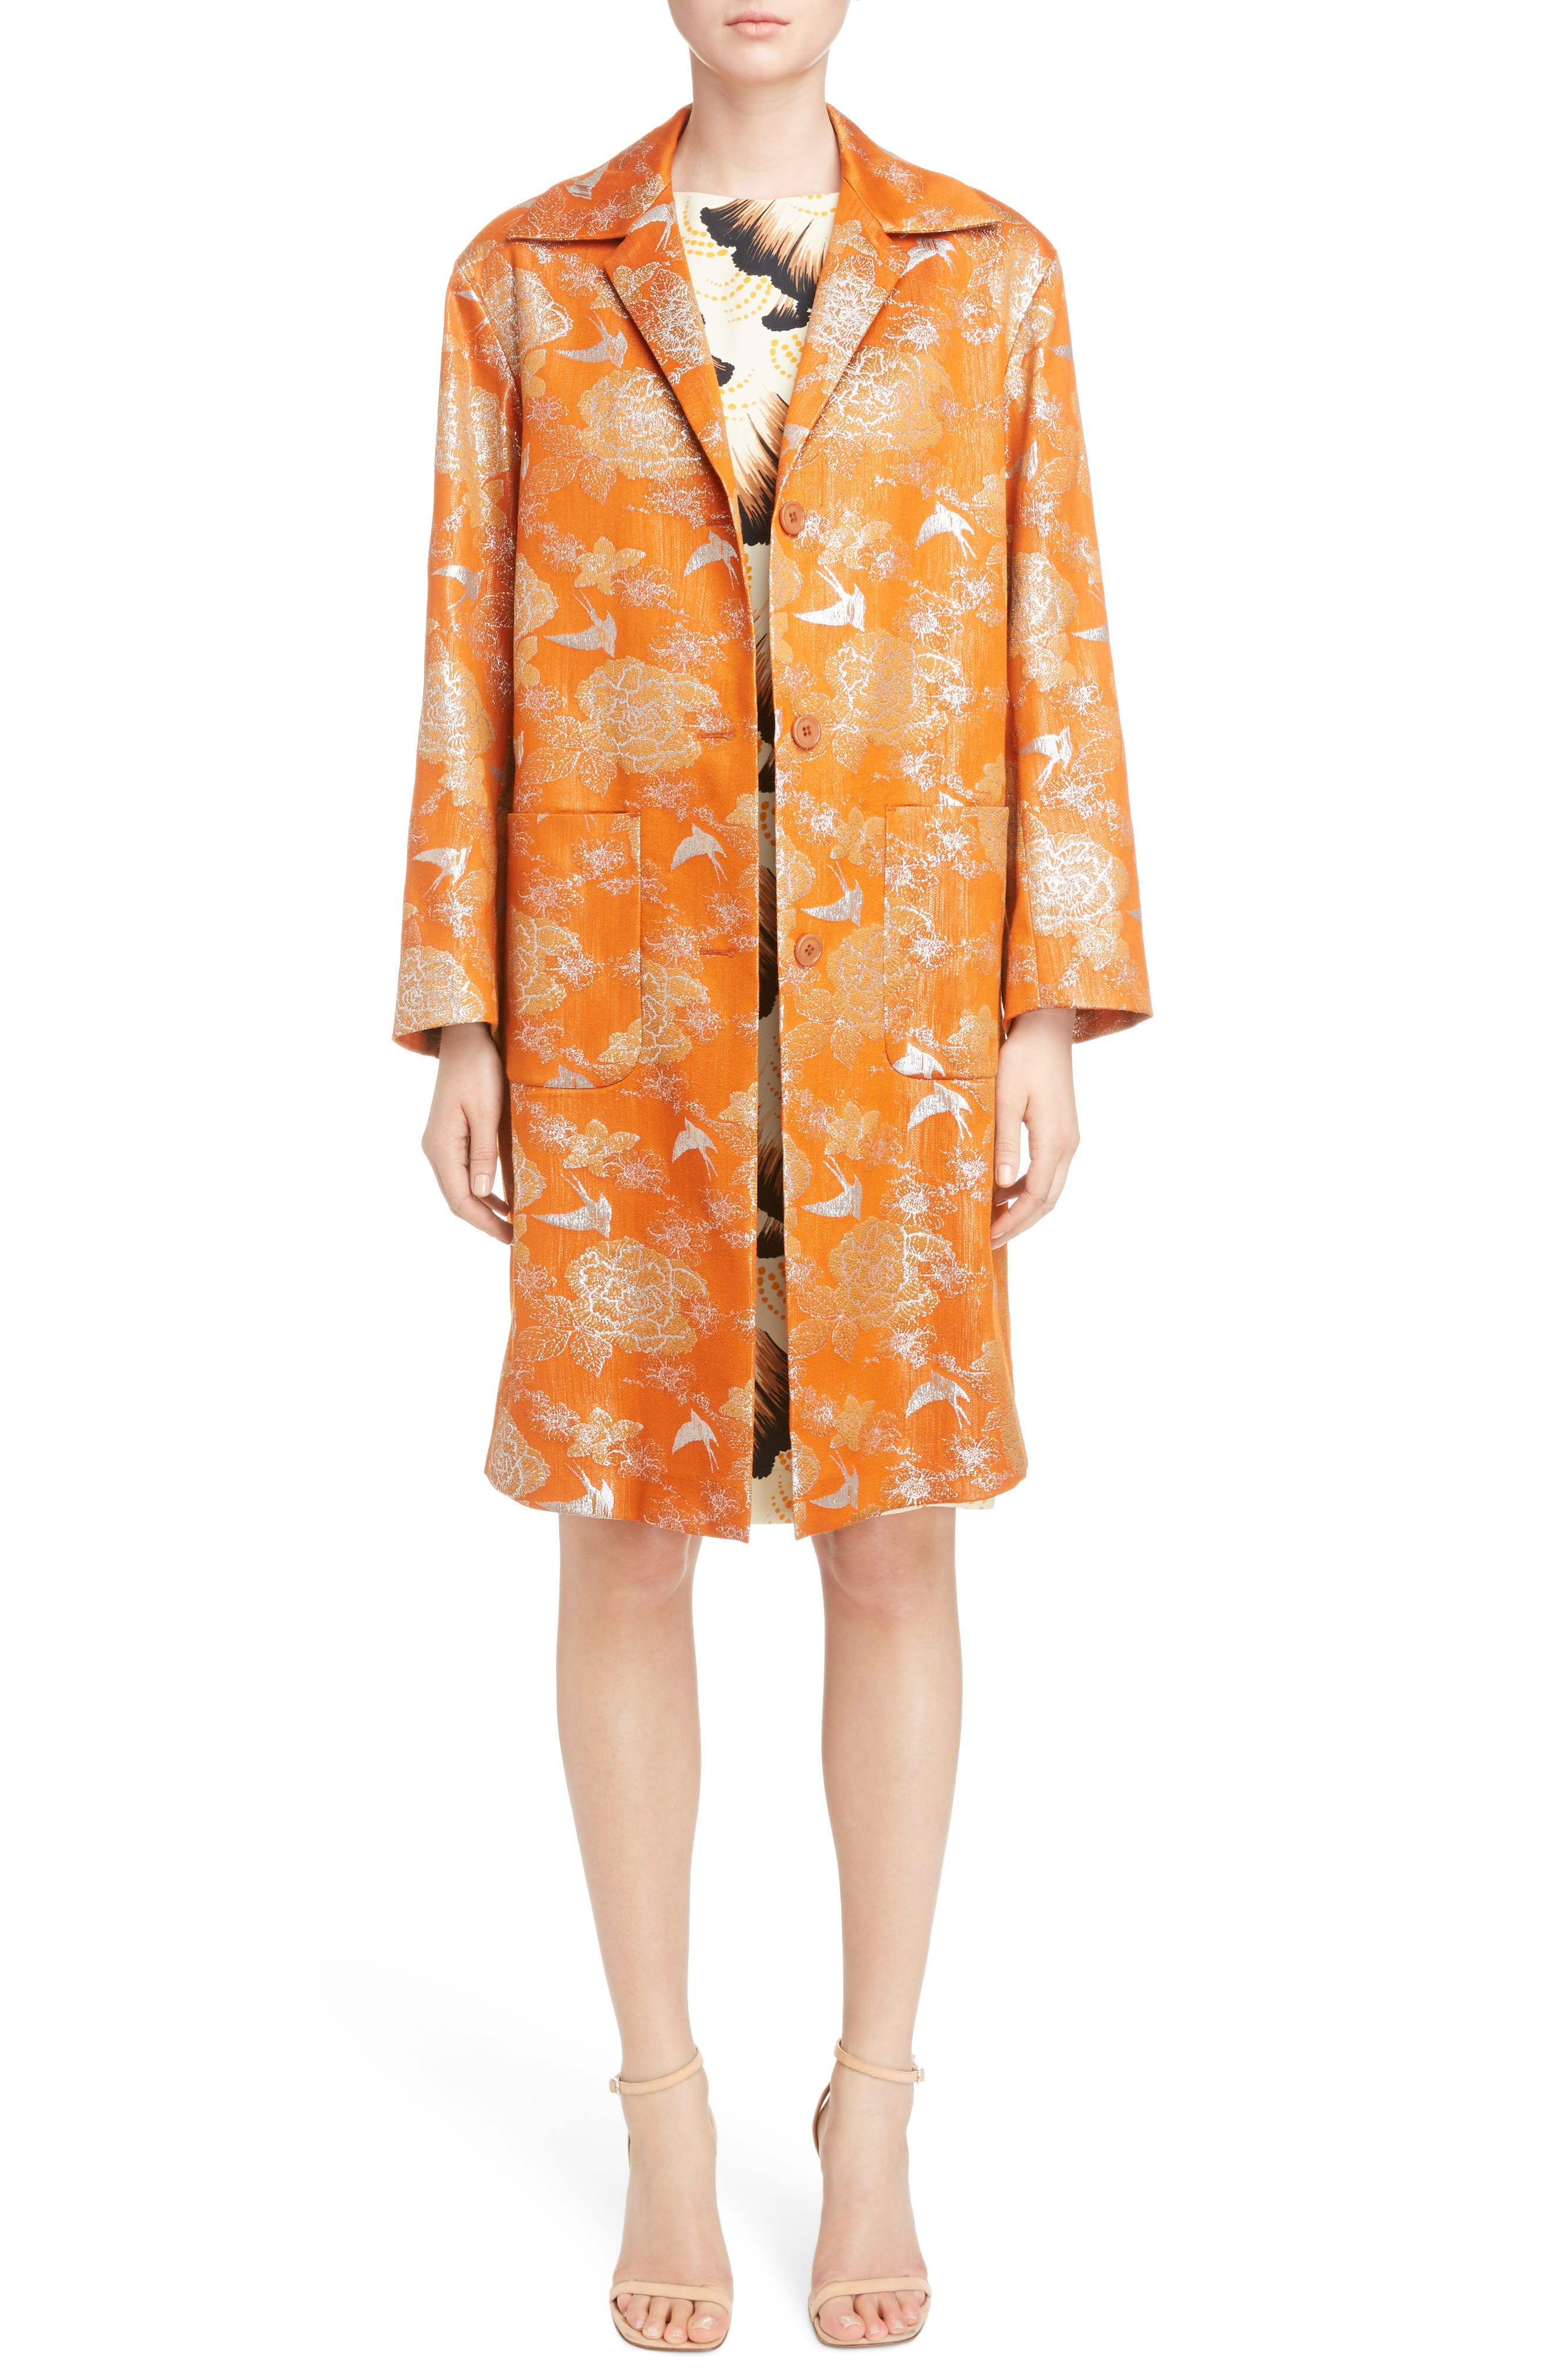 Silver Bird Jacquard Coat,                             Alternate thumbnail 6, color,                             Orange